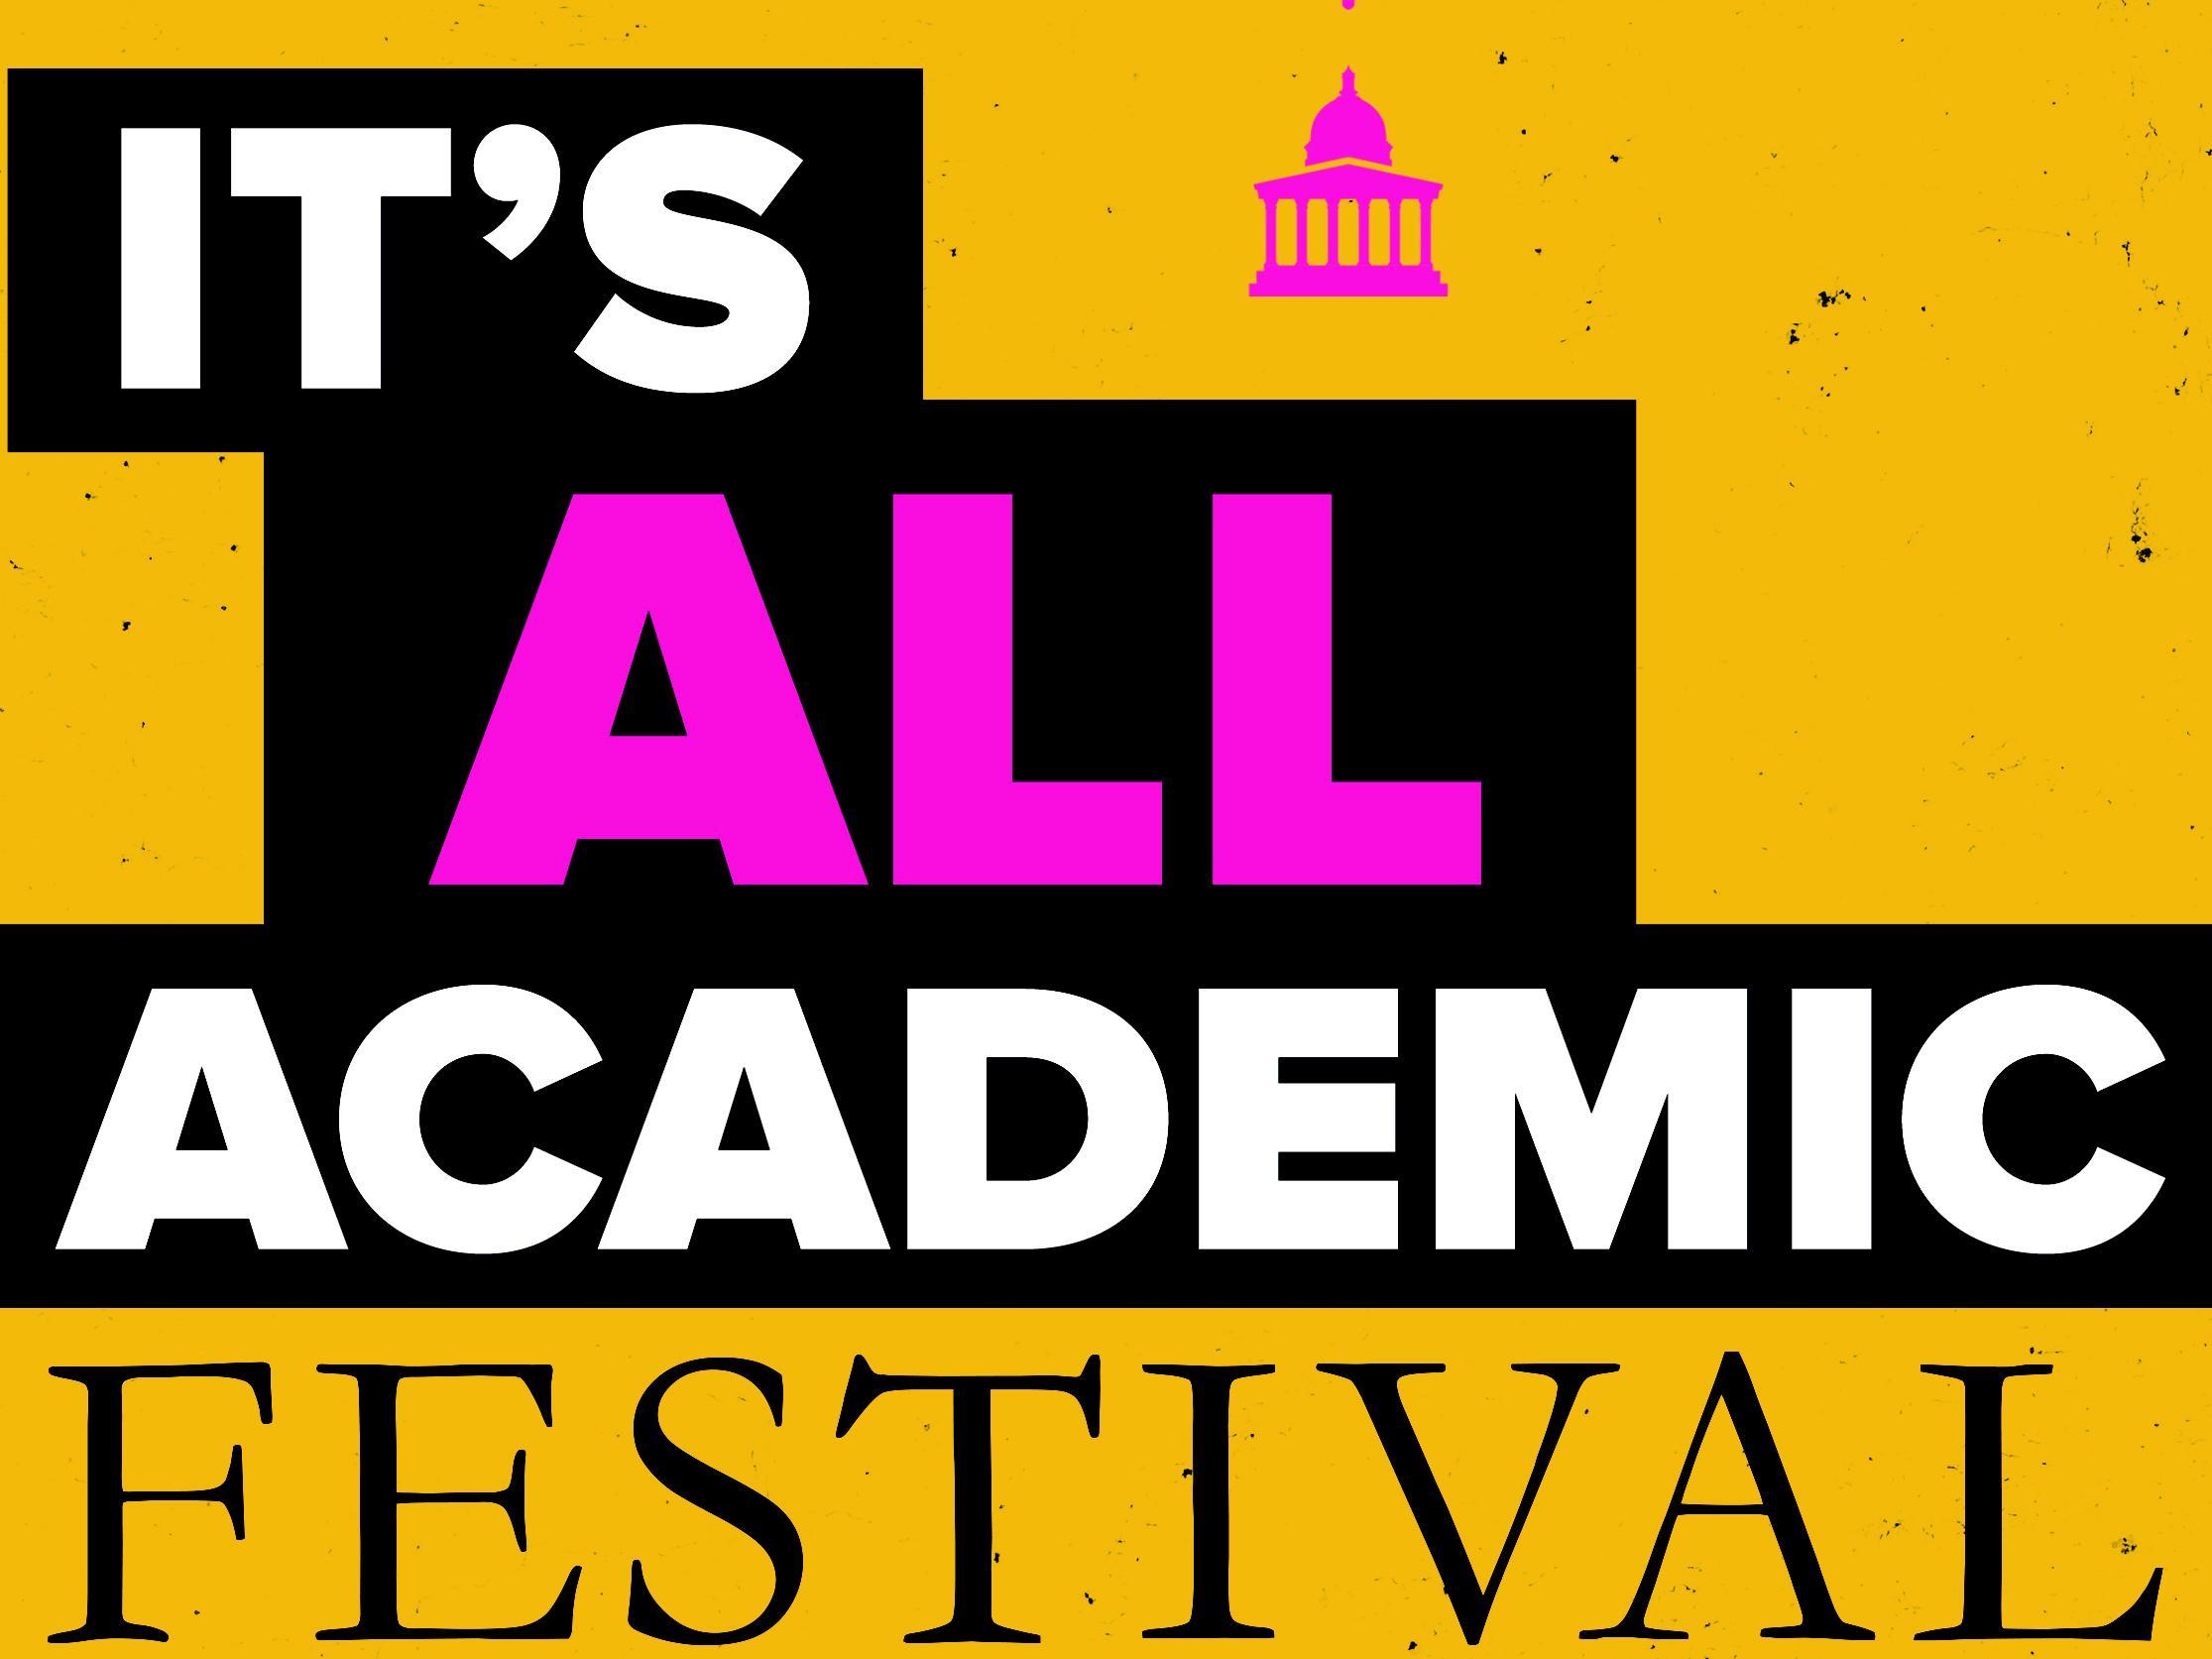 Festival Wordmark Pink